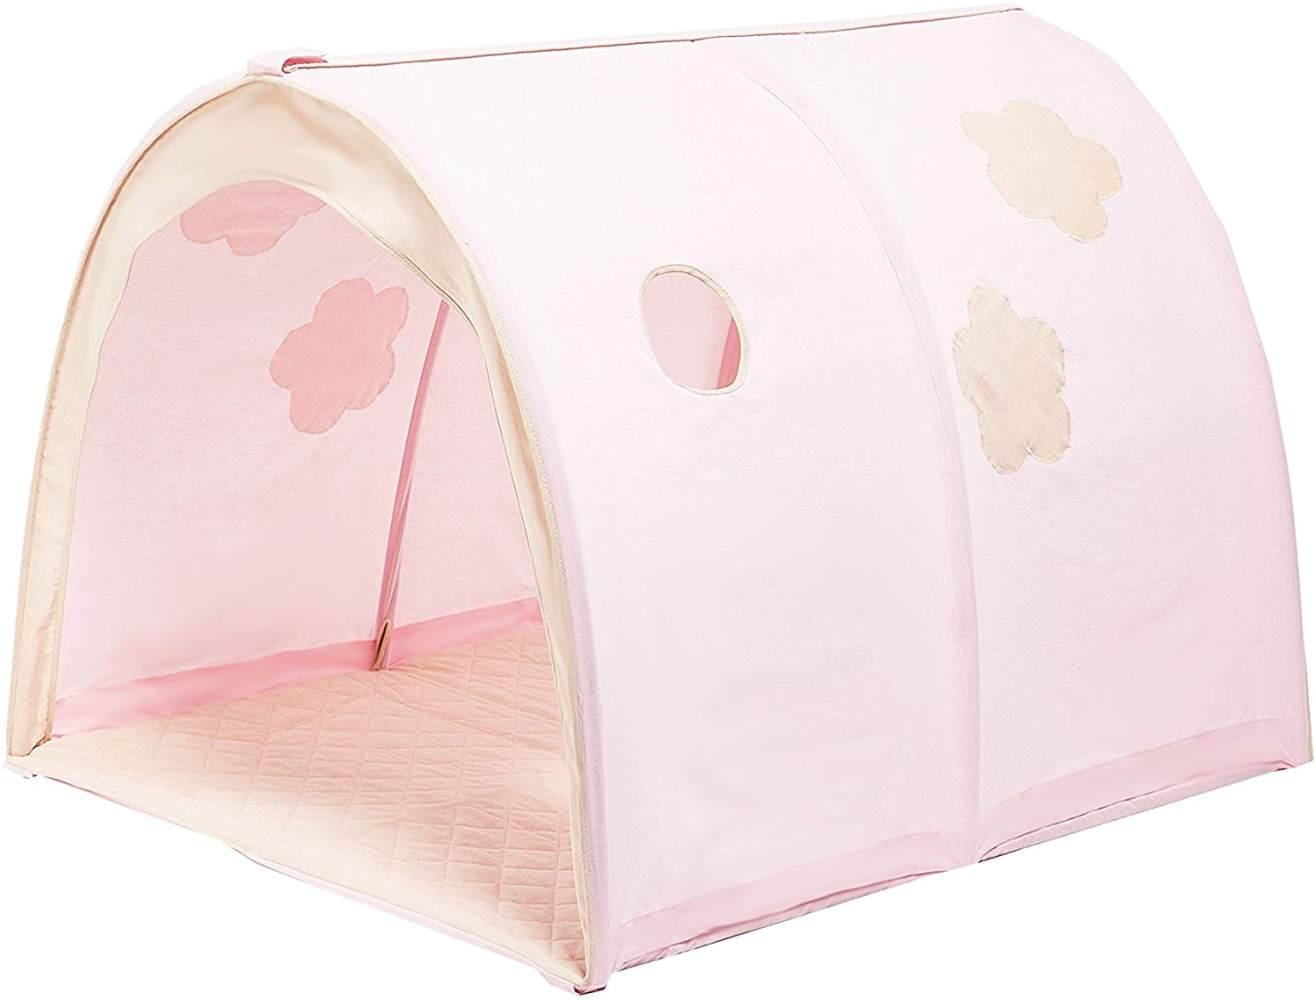 Hoppekids 'Fairytale Flower' Betttunnel / Spieltunnel rosa Bild 1